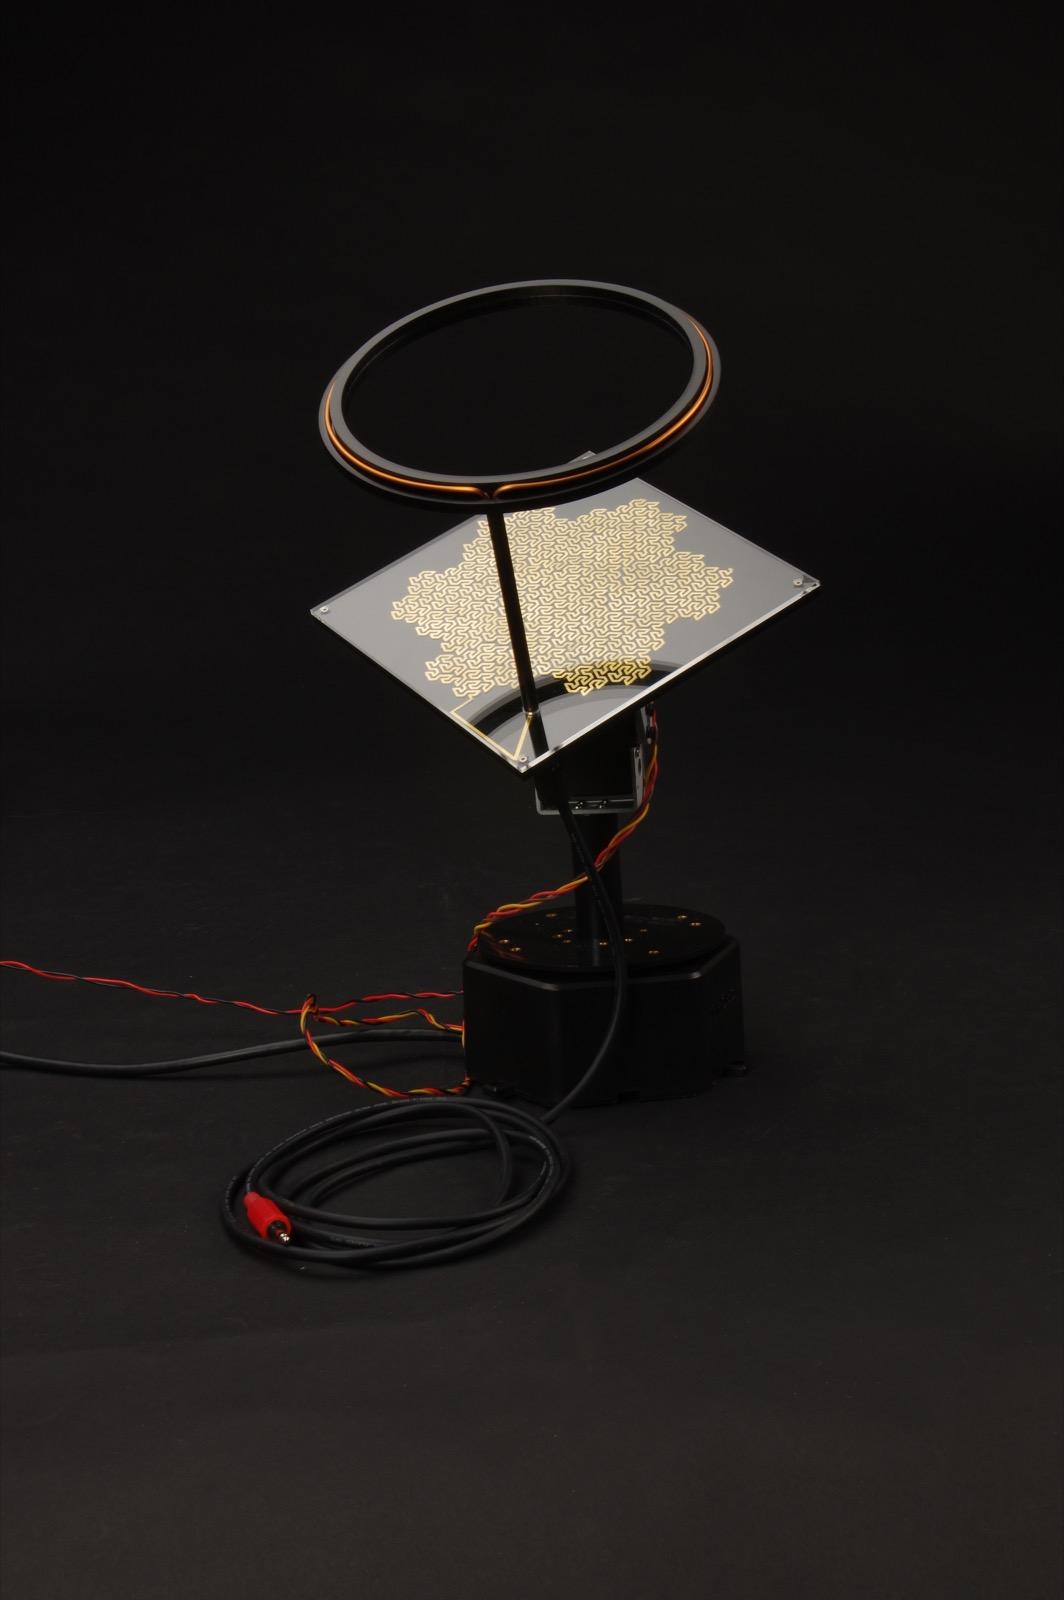 Jovian Receiver 21.1mhz and Fractal Loop Antennae